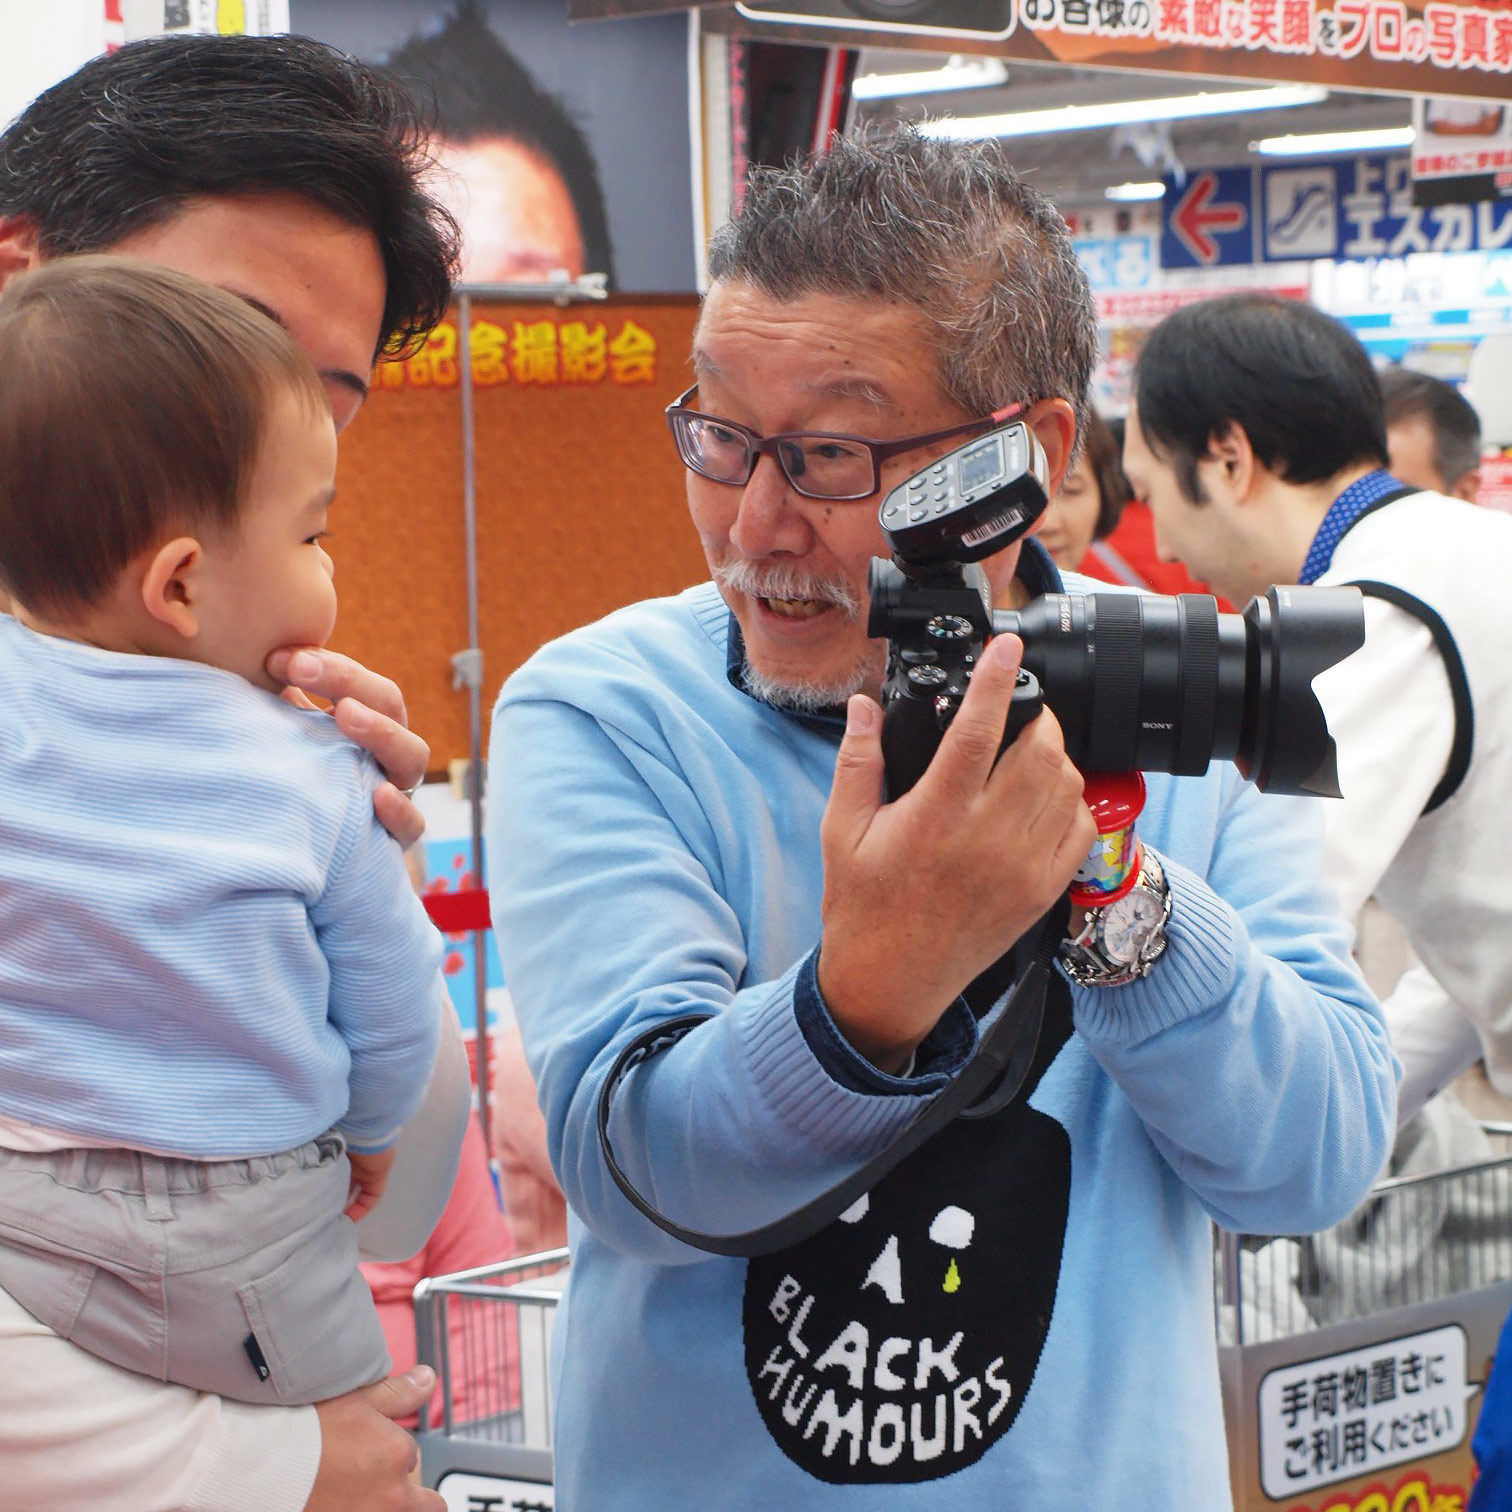 ヨドバシ新春撮影会 Day 1    1月2日(木) 6782_b0069507_07555882.jpg